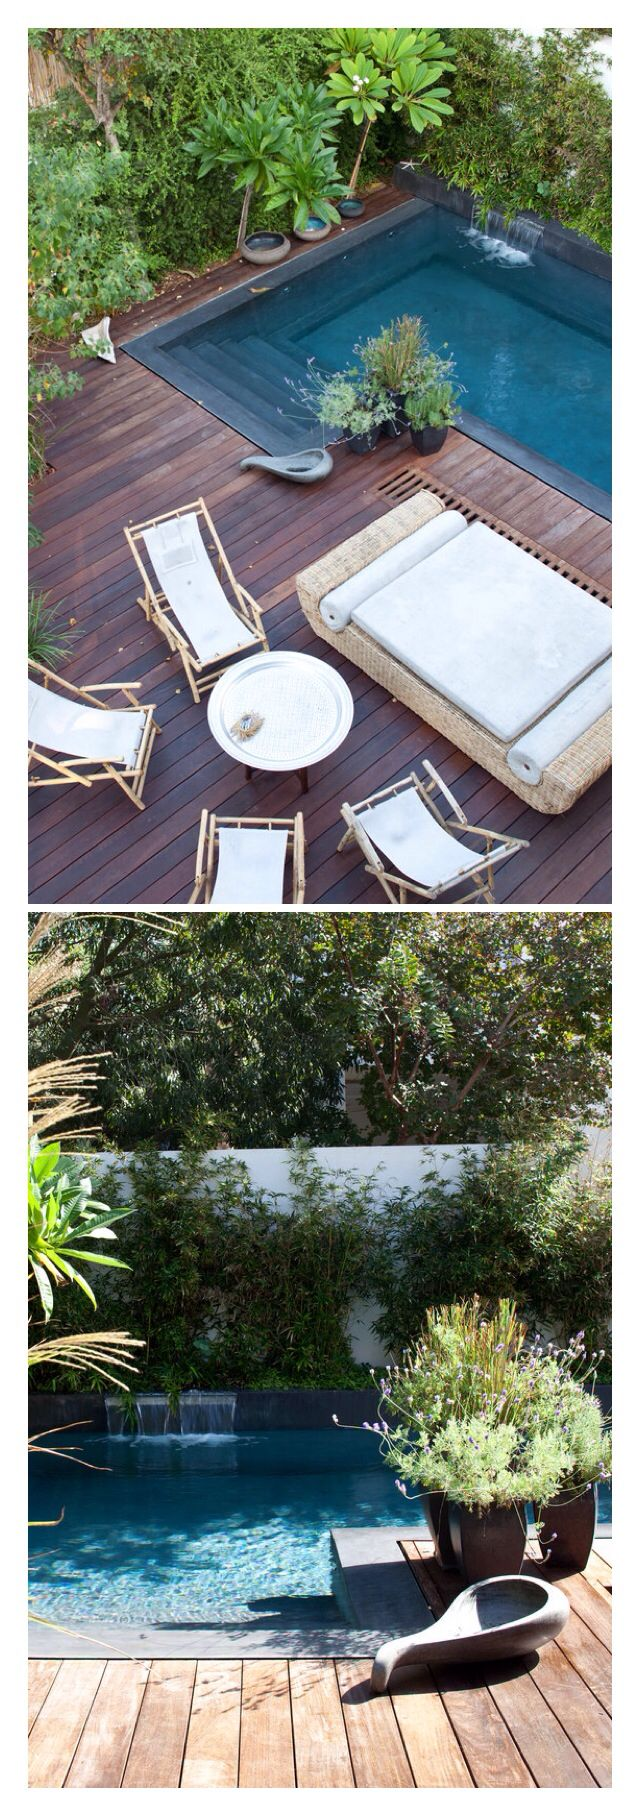 #Luxury#Homes#Pools#Outdoors